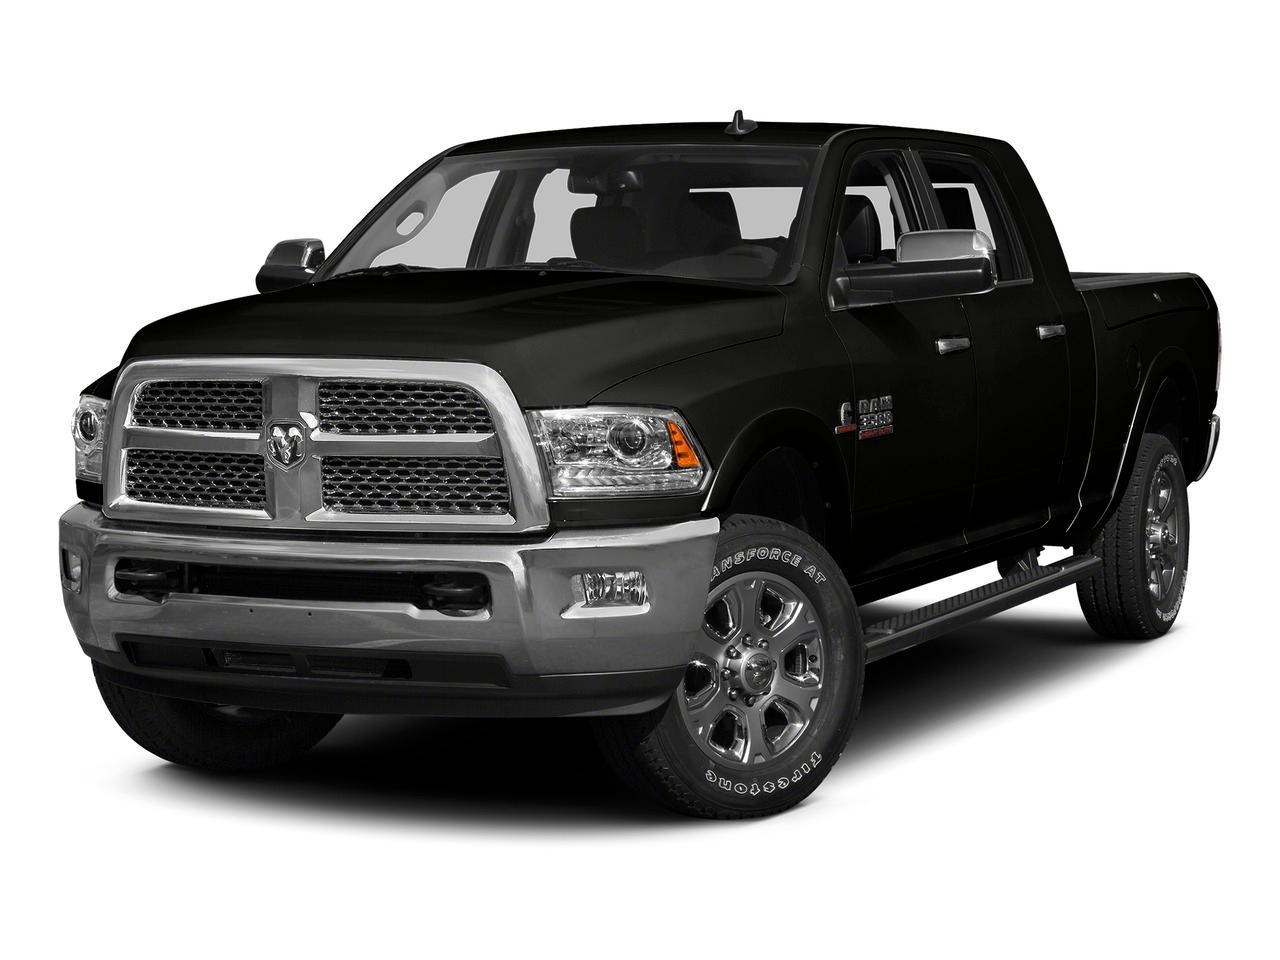 2015 Ram 3500 Vehicle Photo in Corpus Christi, TX 78411